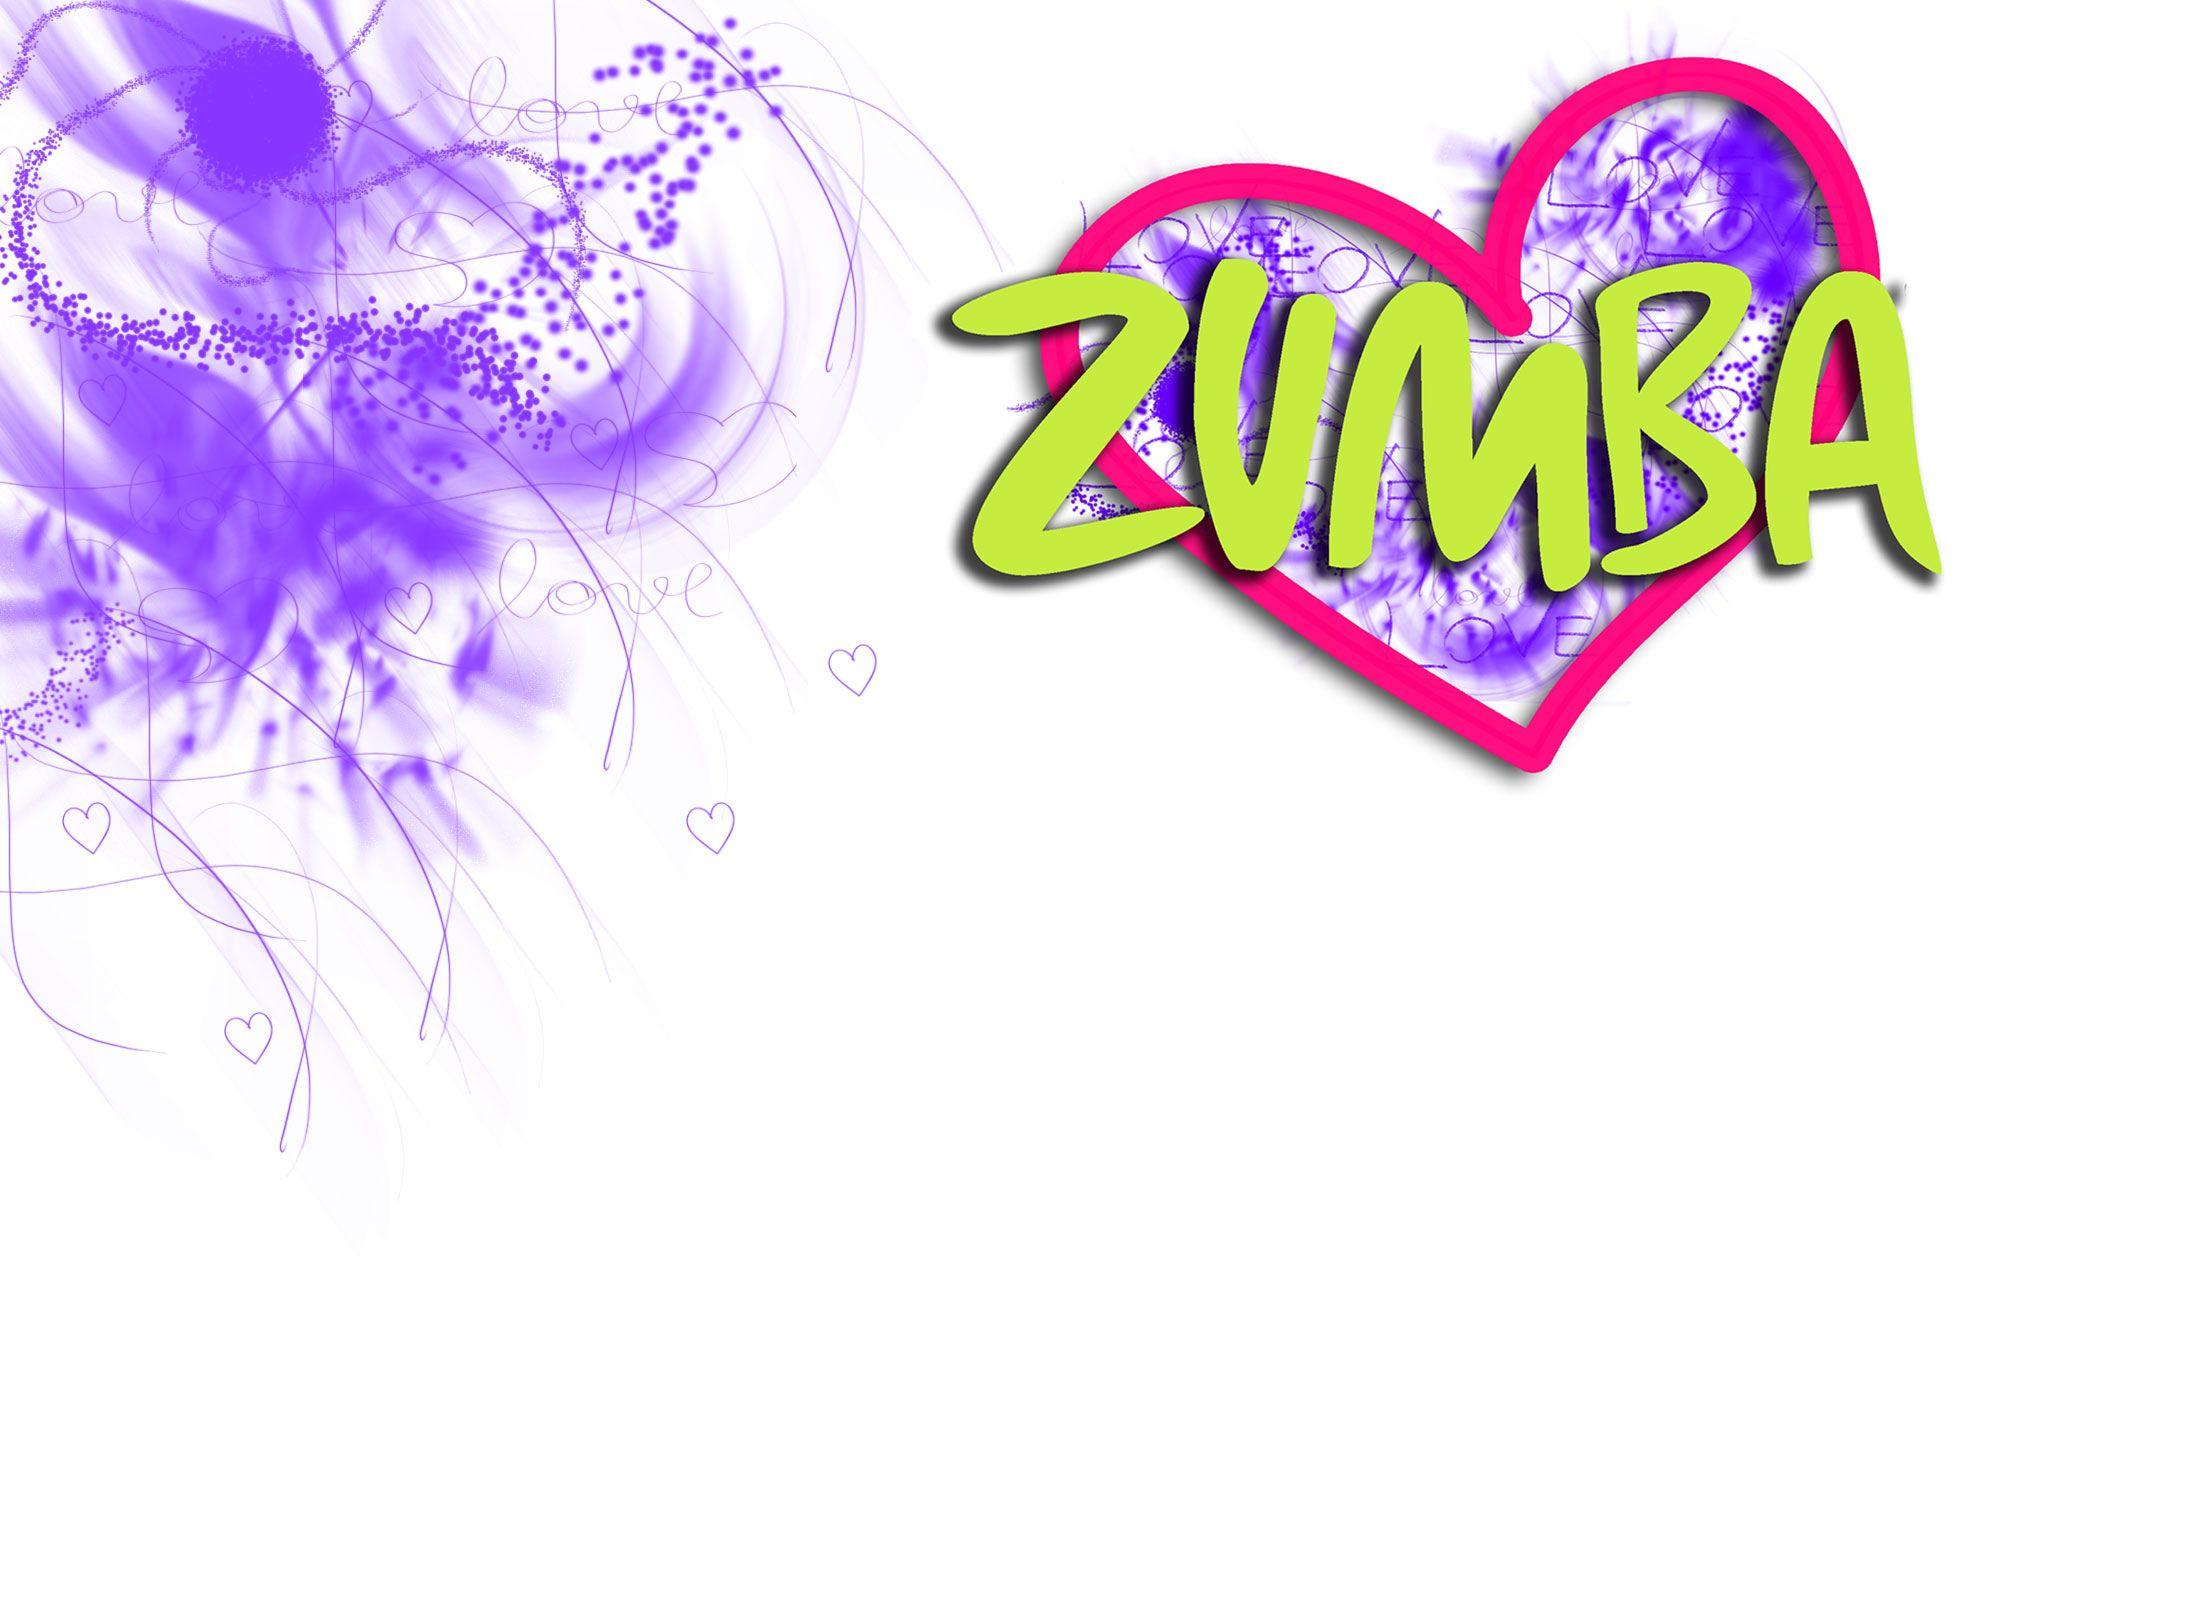 zumba logo clip art zumba pictures images photos wallpaper zumba rh pinterest com zumba logos images zumba logo svg free